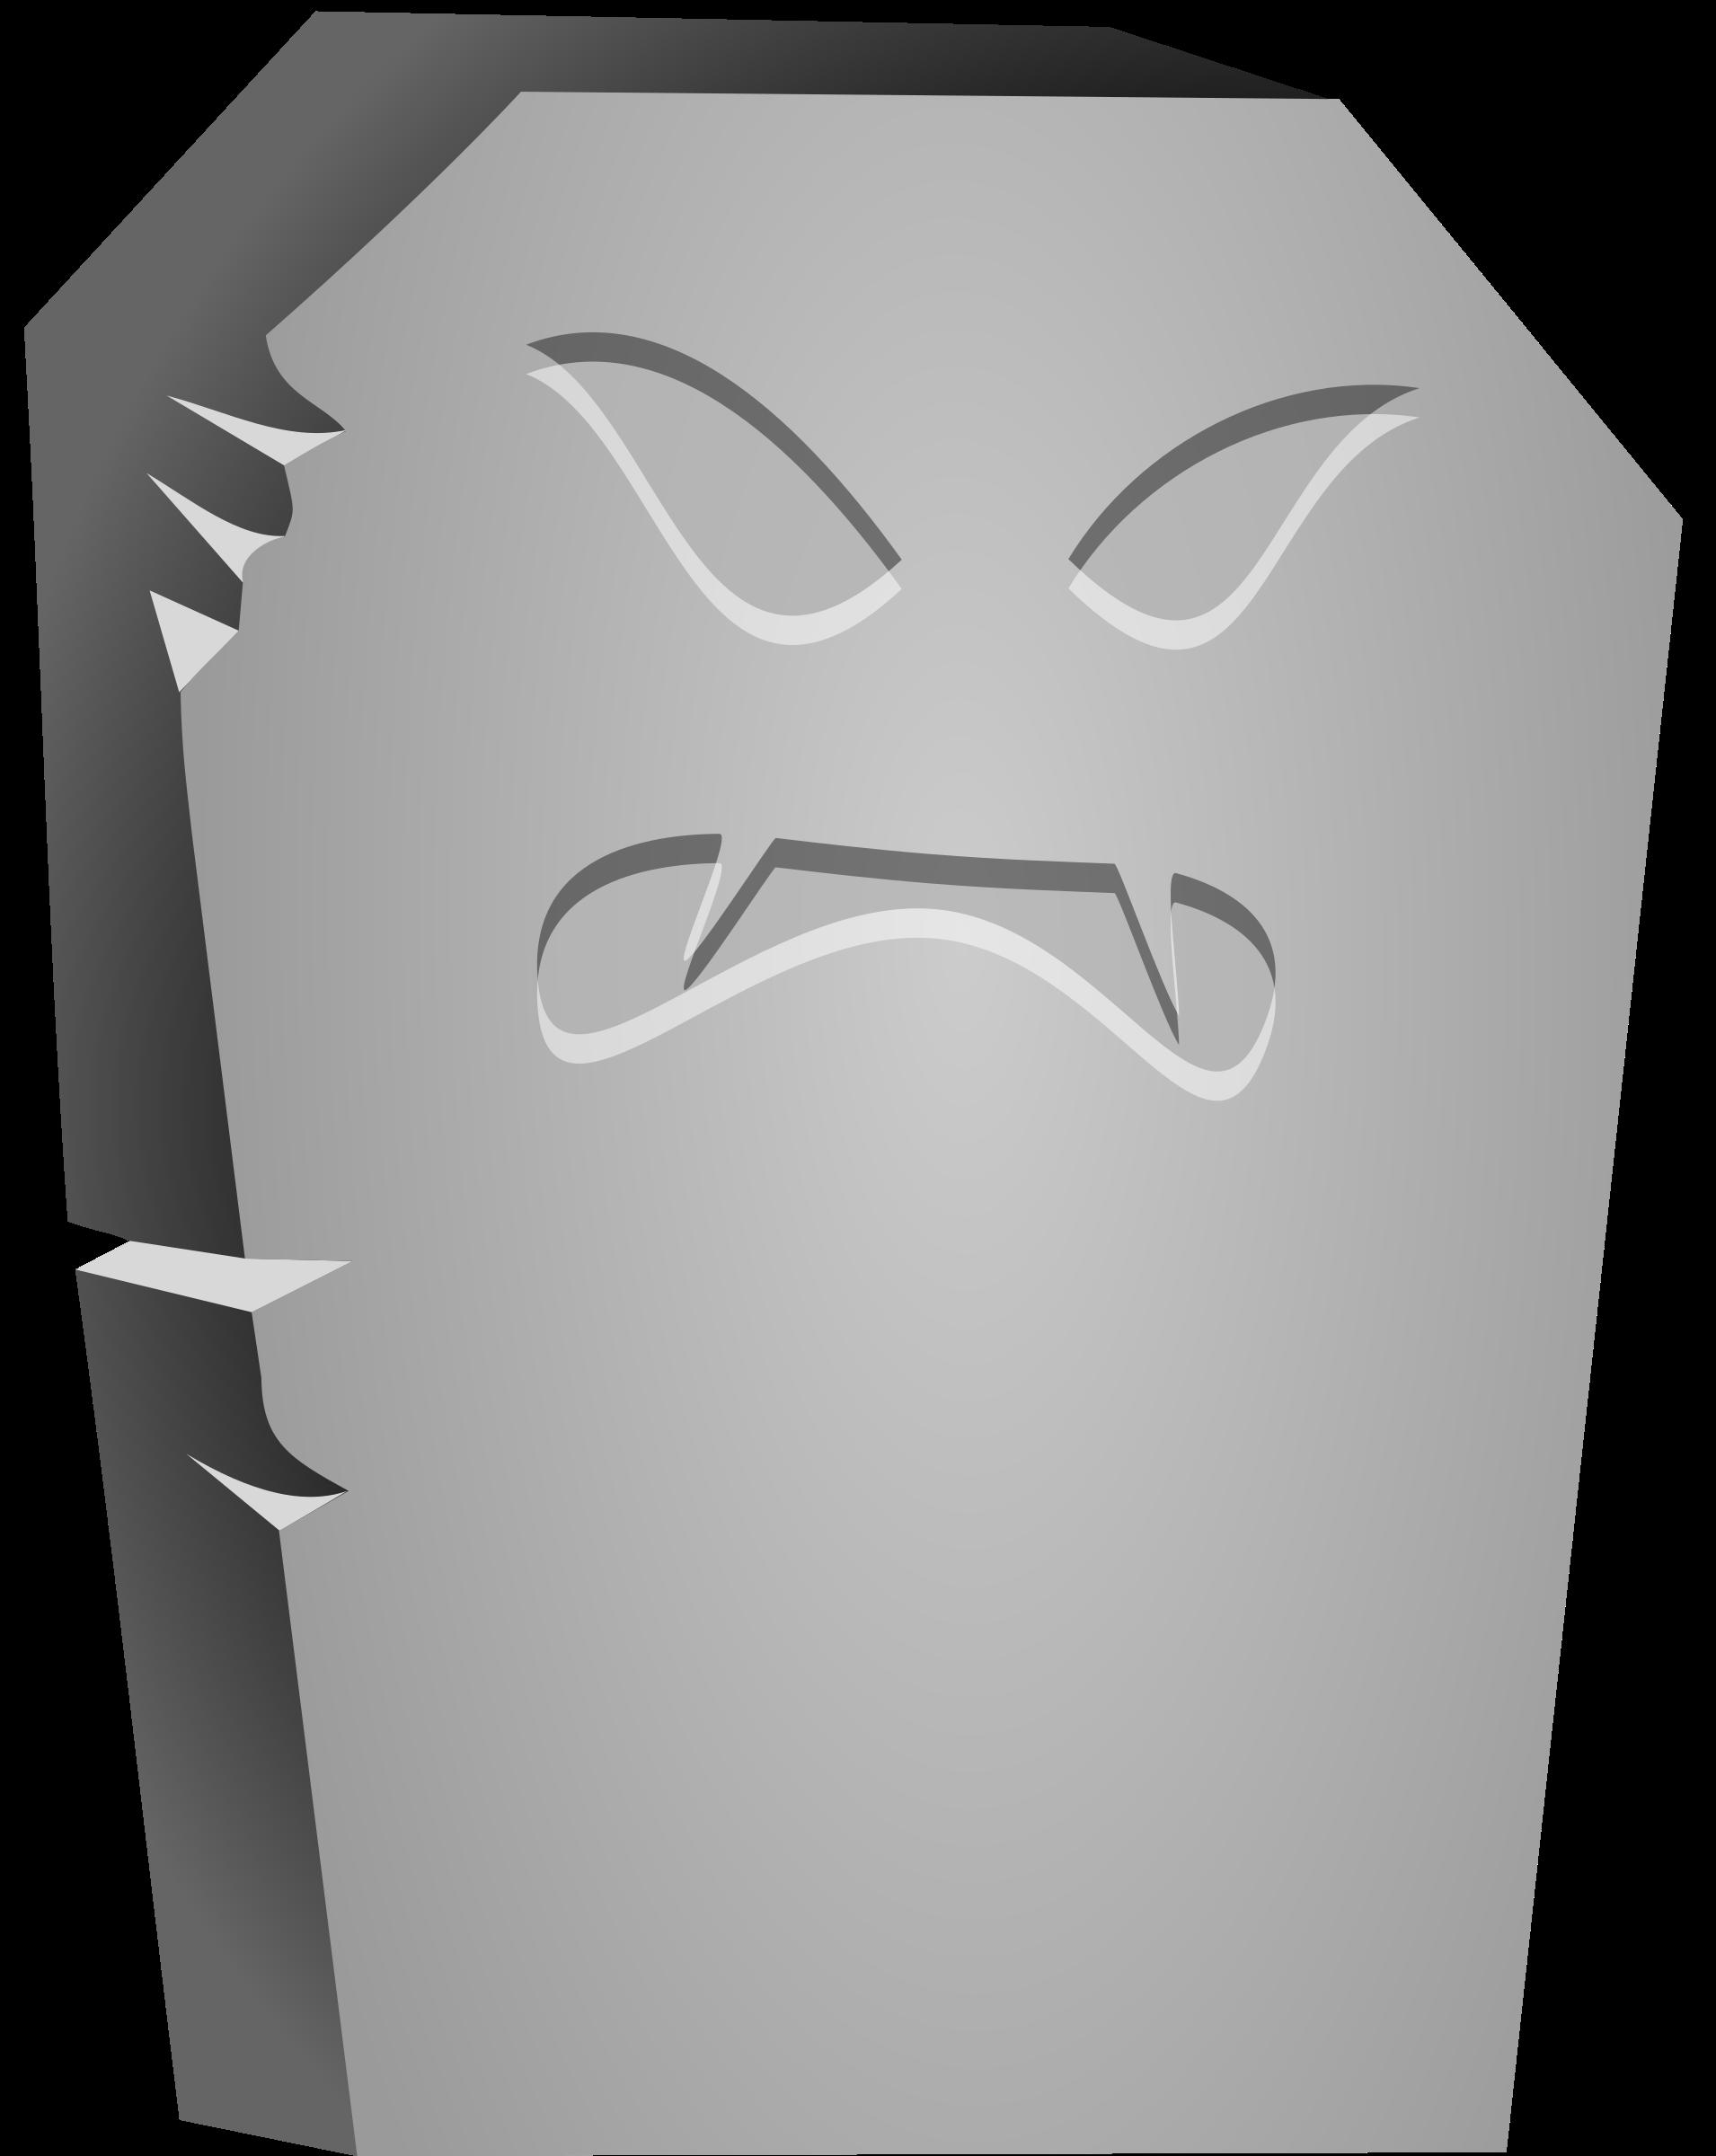 Clipart tombstone halloween image free stock Clipart - Halloween Tombstone Angry Face image free stock